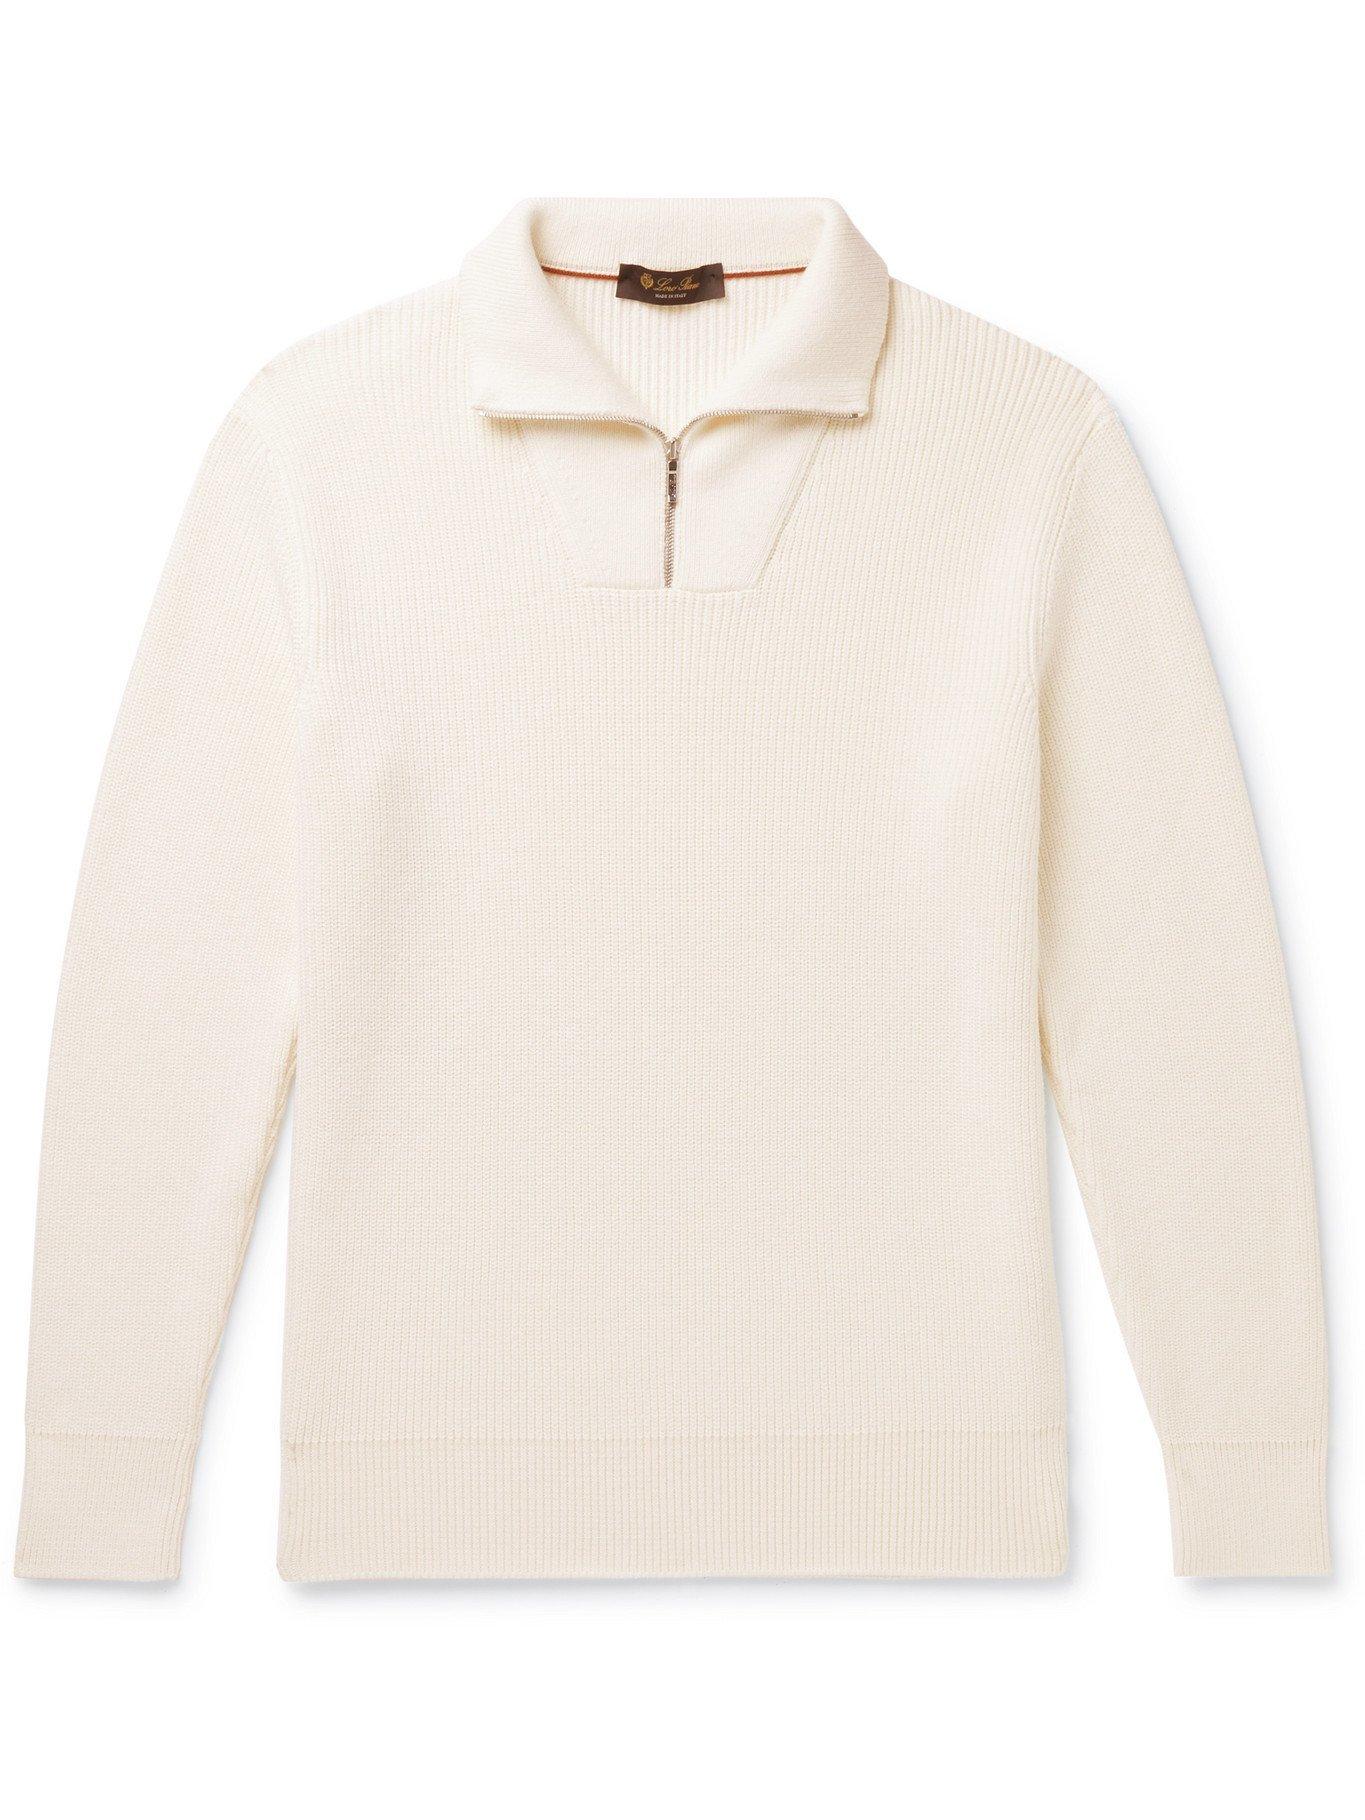 Photo: LORO PIANA - Ribbed Cotton and Silk-Blend Half-Zip Sweater - White - IT 48